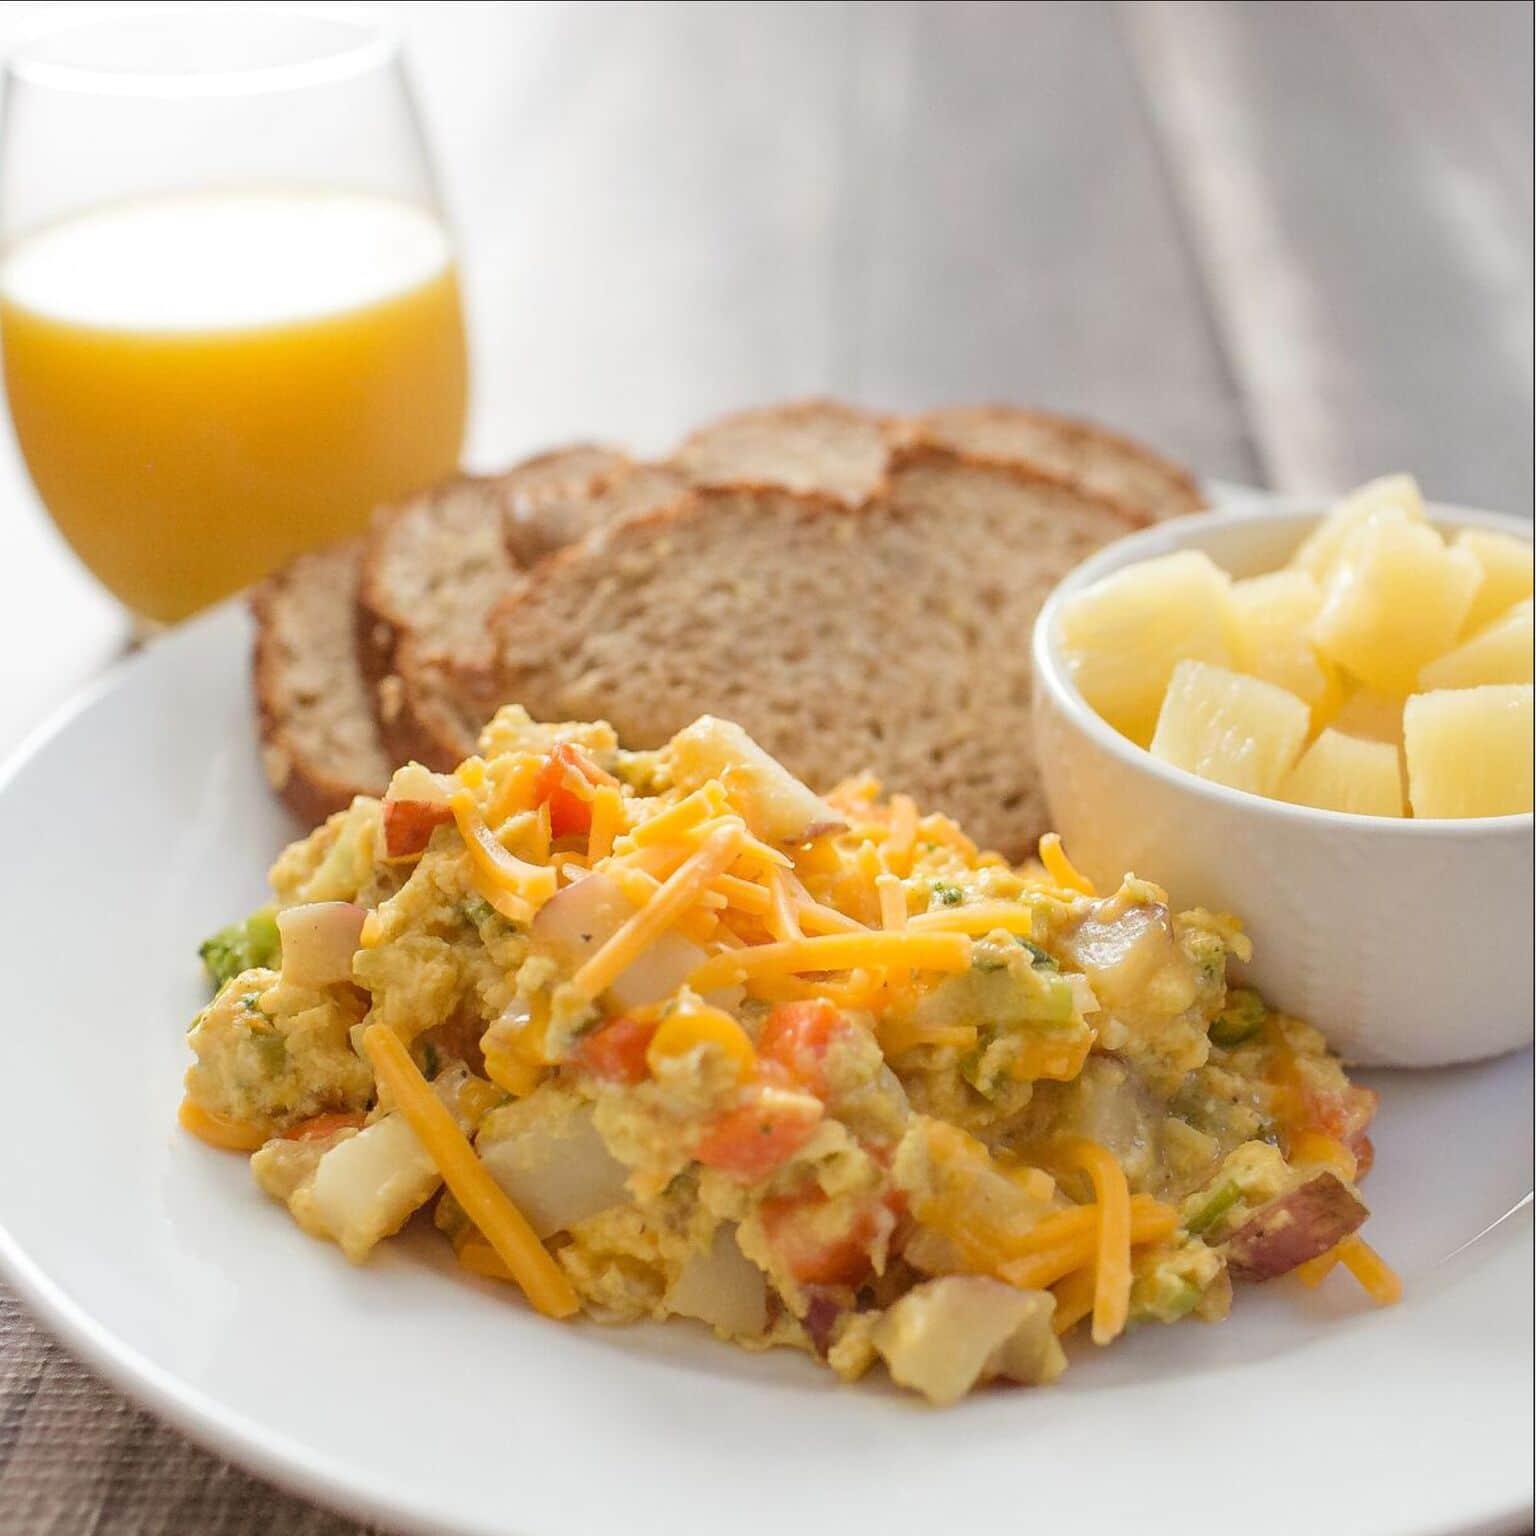 Fresh Veggie Scramble⎢Fast and Healthy Breakfast Recipe⎢Egg Recipe⎢Breakfast Food⎢Food Made Simple⎢Brunch Recipe